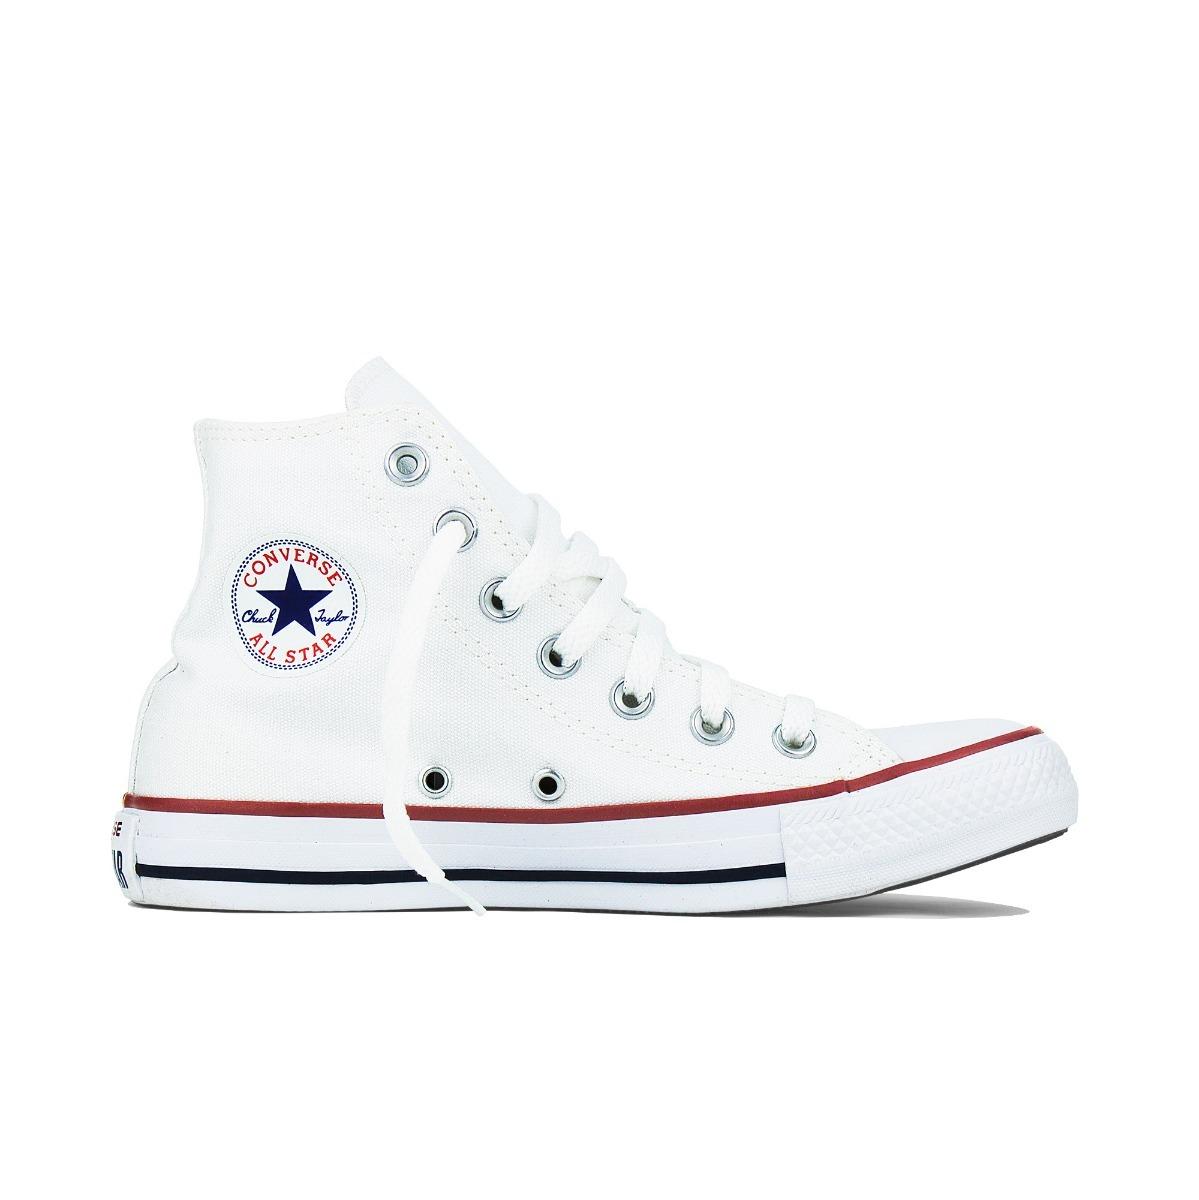 1822e42704 tênis converse all star chuck taylor cano alto branco tecido. Carregando  zoom.